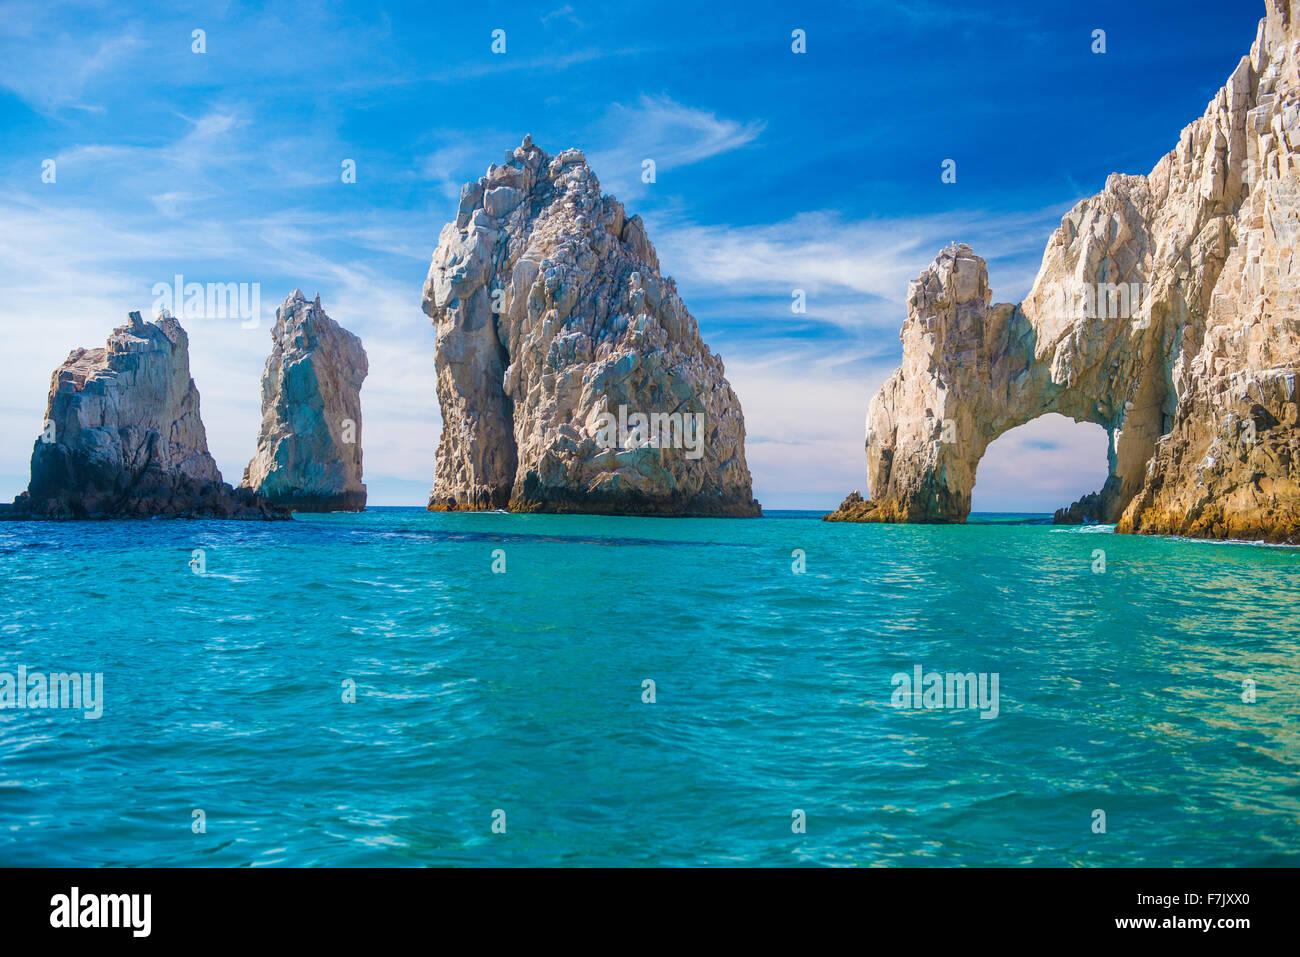 Arch, Baja California, Mexiko Meer Arch in Endland, Tipp von Baja Peninsula in Cabo San Lucas Stockbild